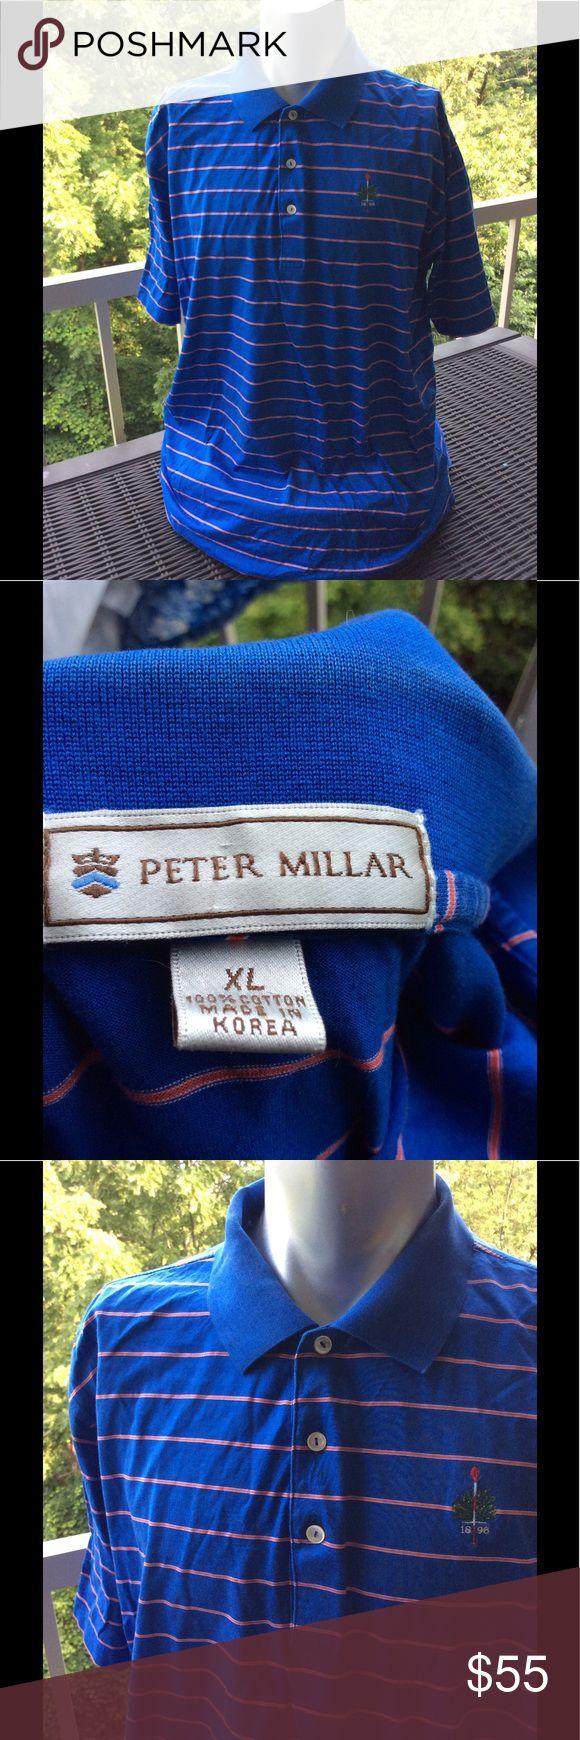 Peter Millar Blue Striped Polo Shirt XL Very popular Peter Millar polo shirt 👚 n striped blue with insignia. EUC. Size XL Peter Millar Shirts Polos